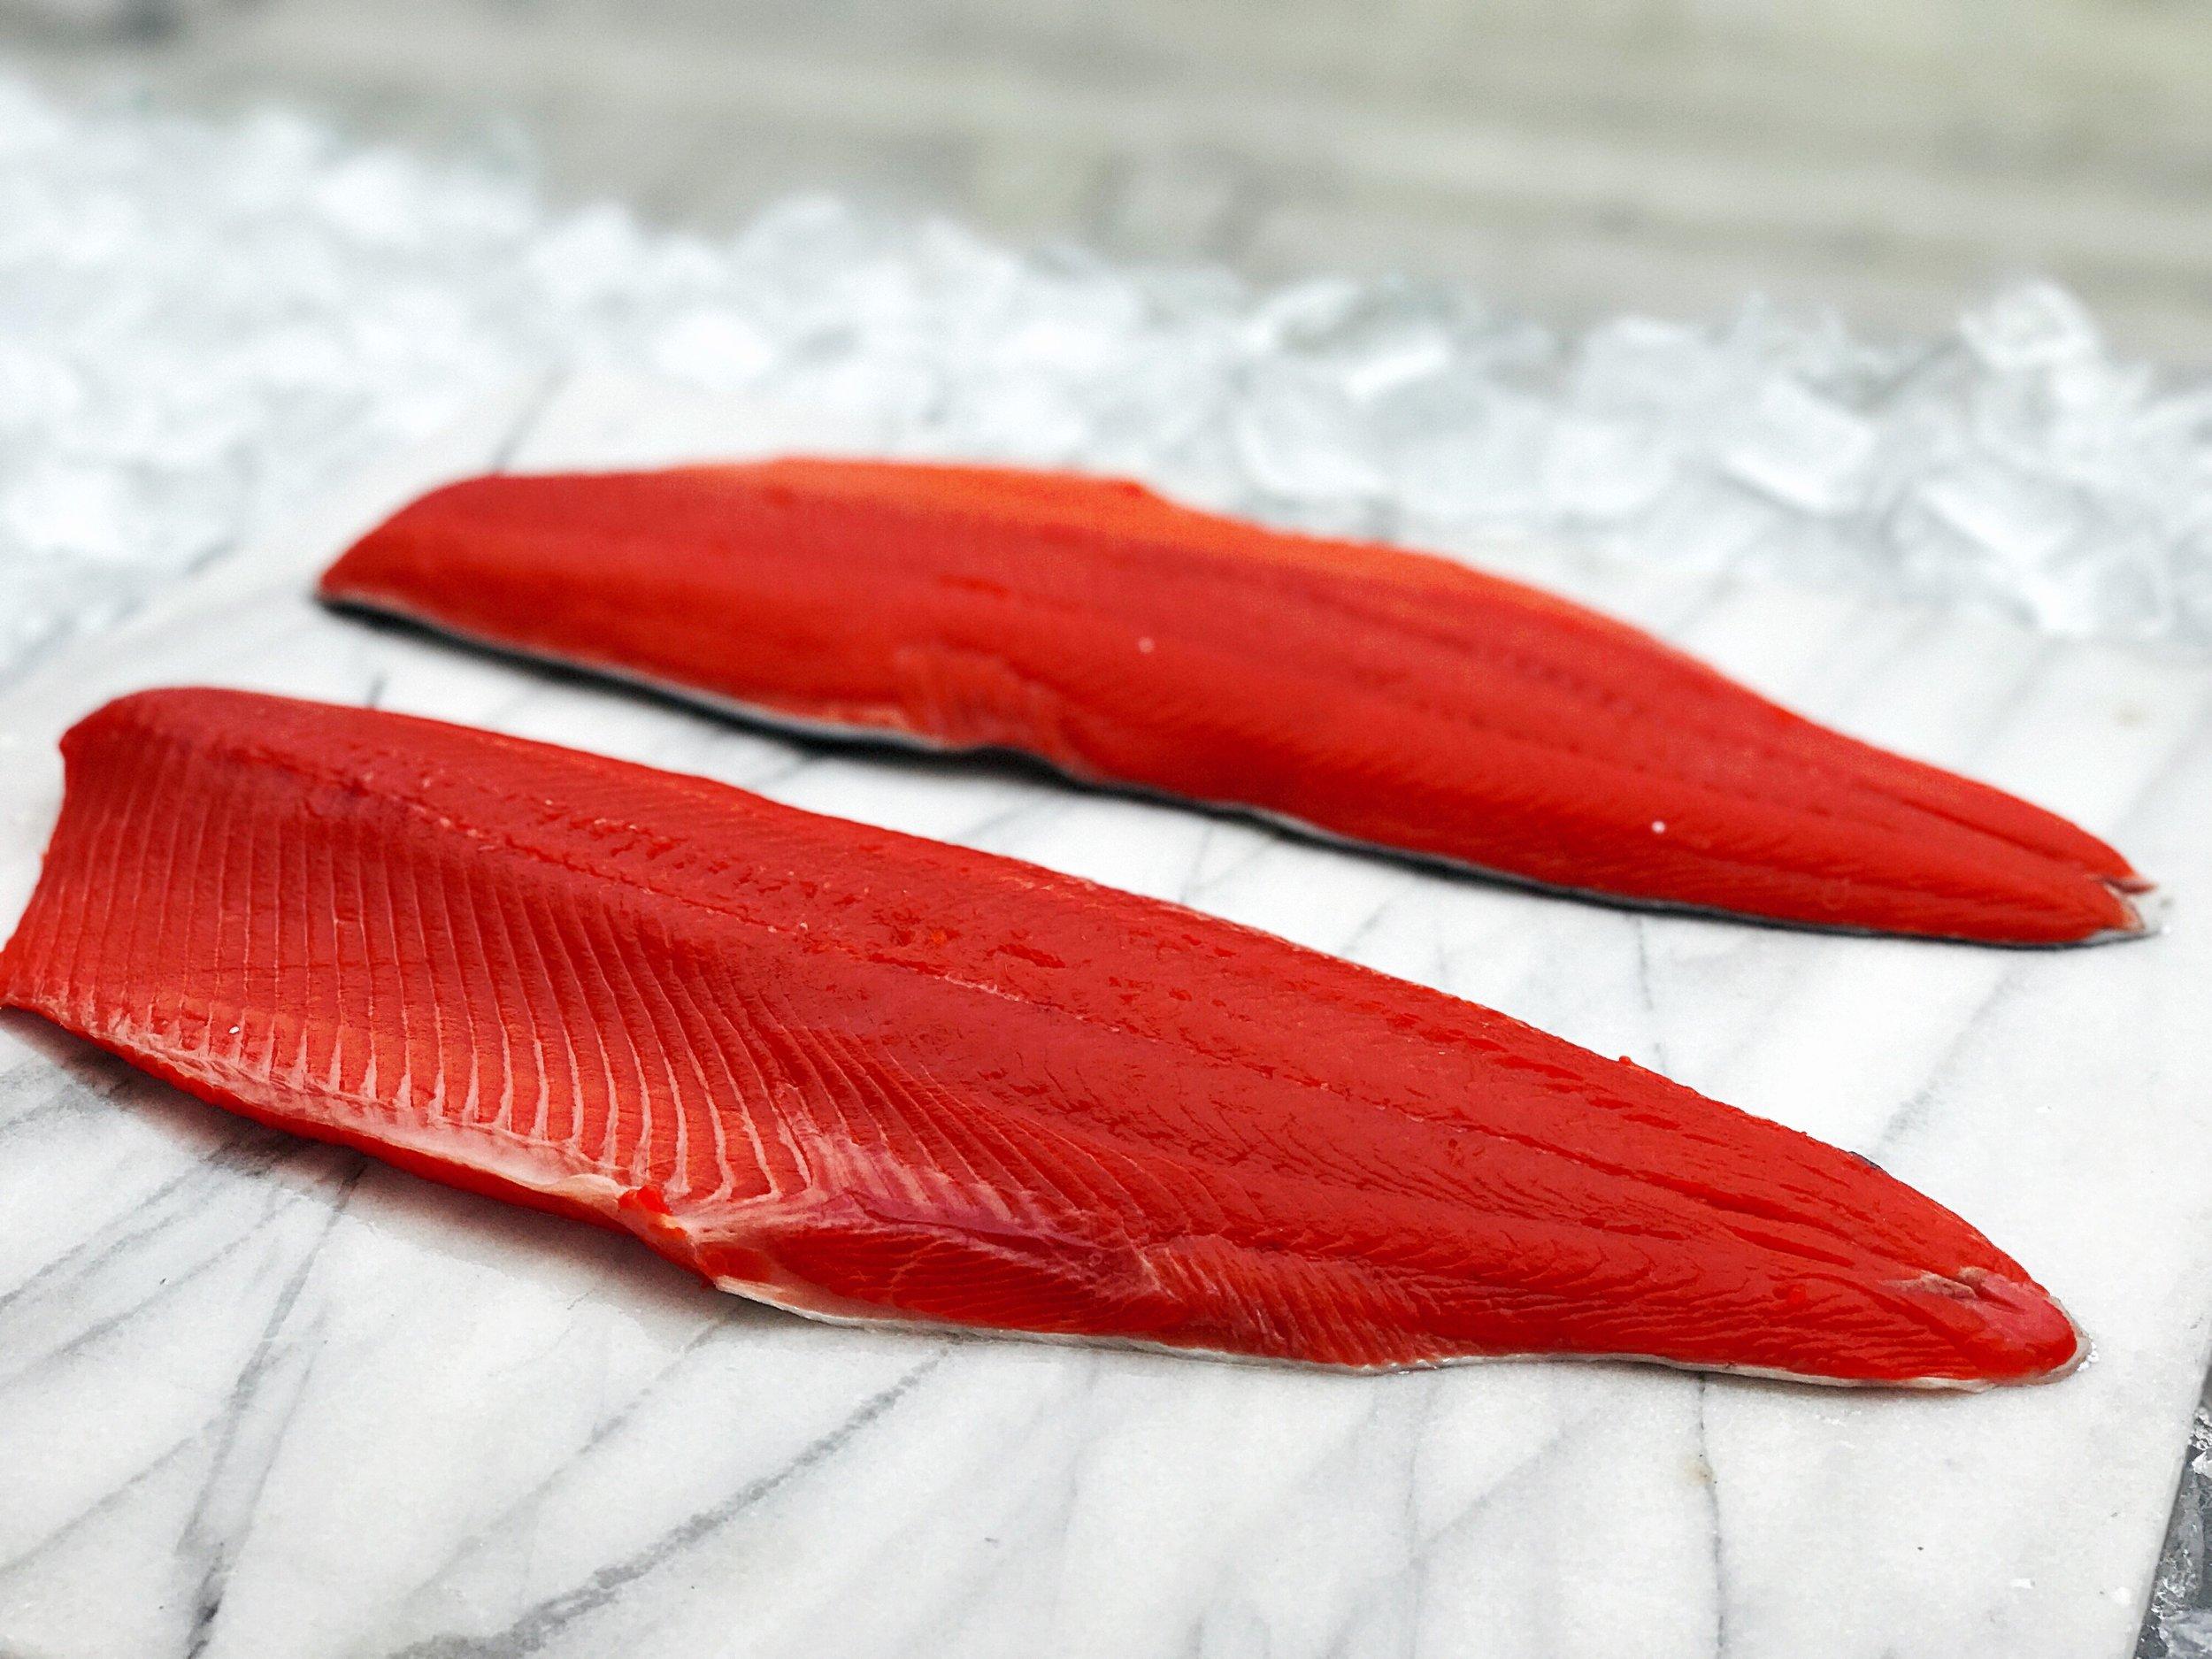 wild sockeye salmon - $16.95/lb